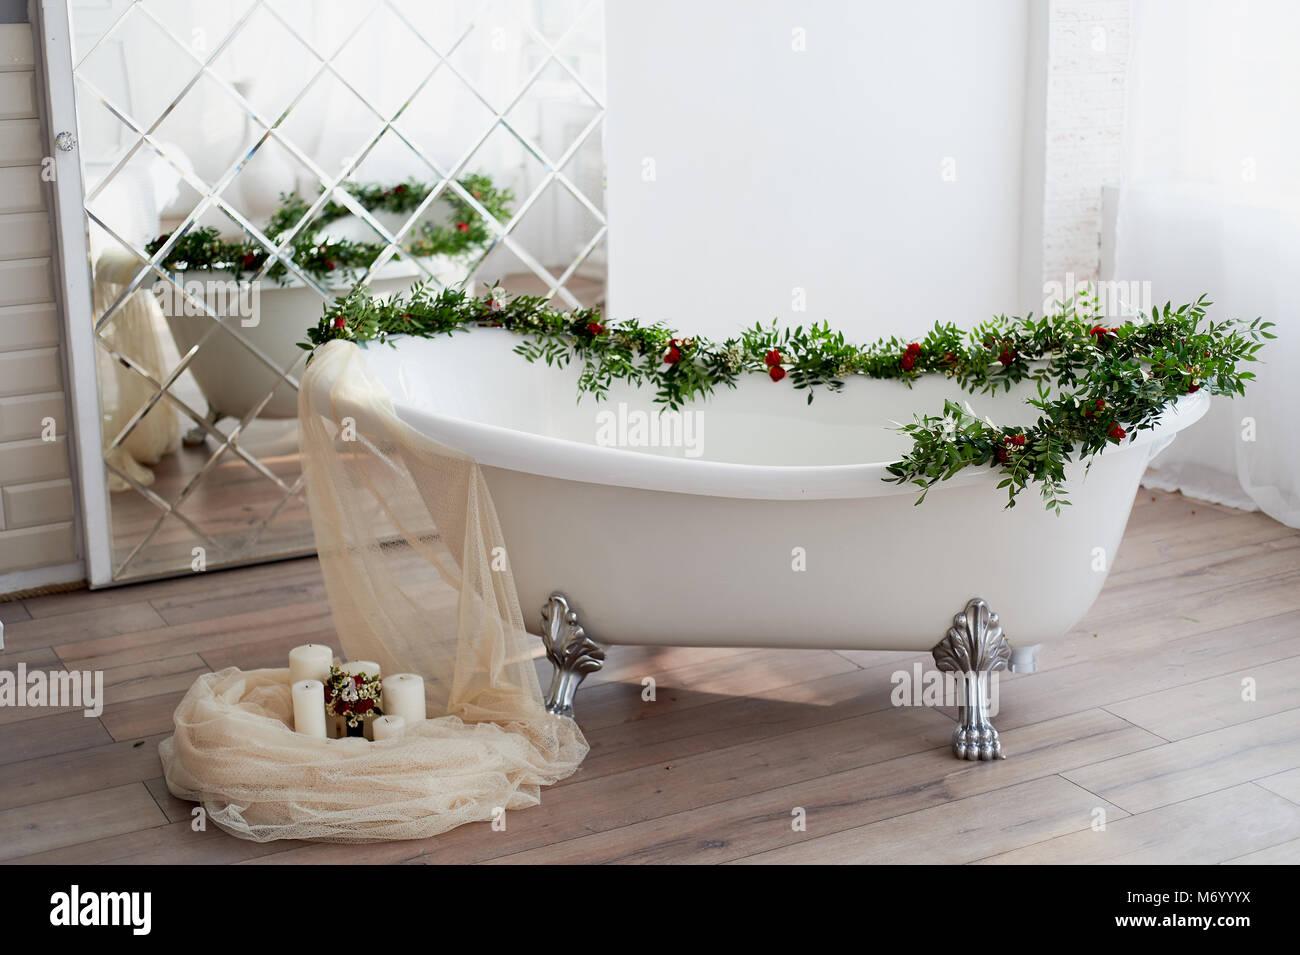 Vasca Da Bagno Con Zampe : Foto vasche da bagno